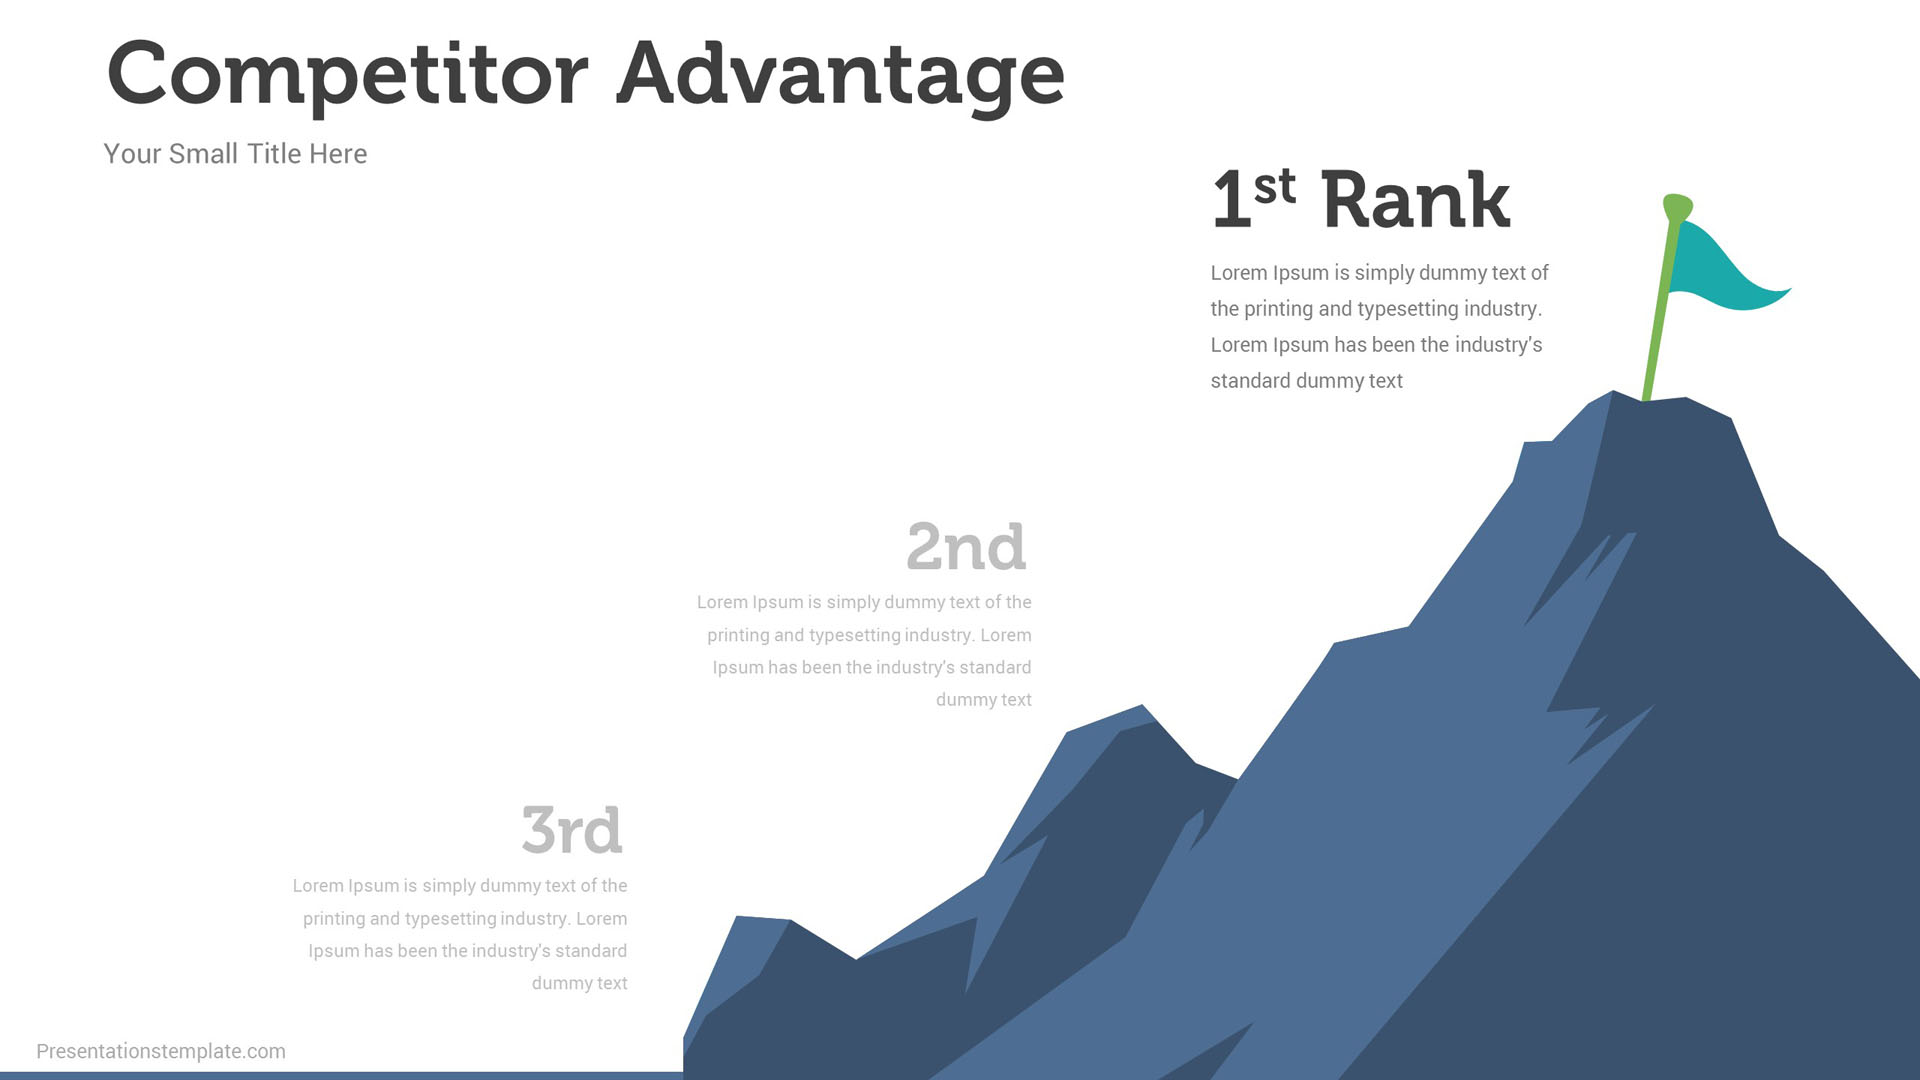 Competitive Advantages Presentations Template